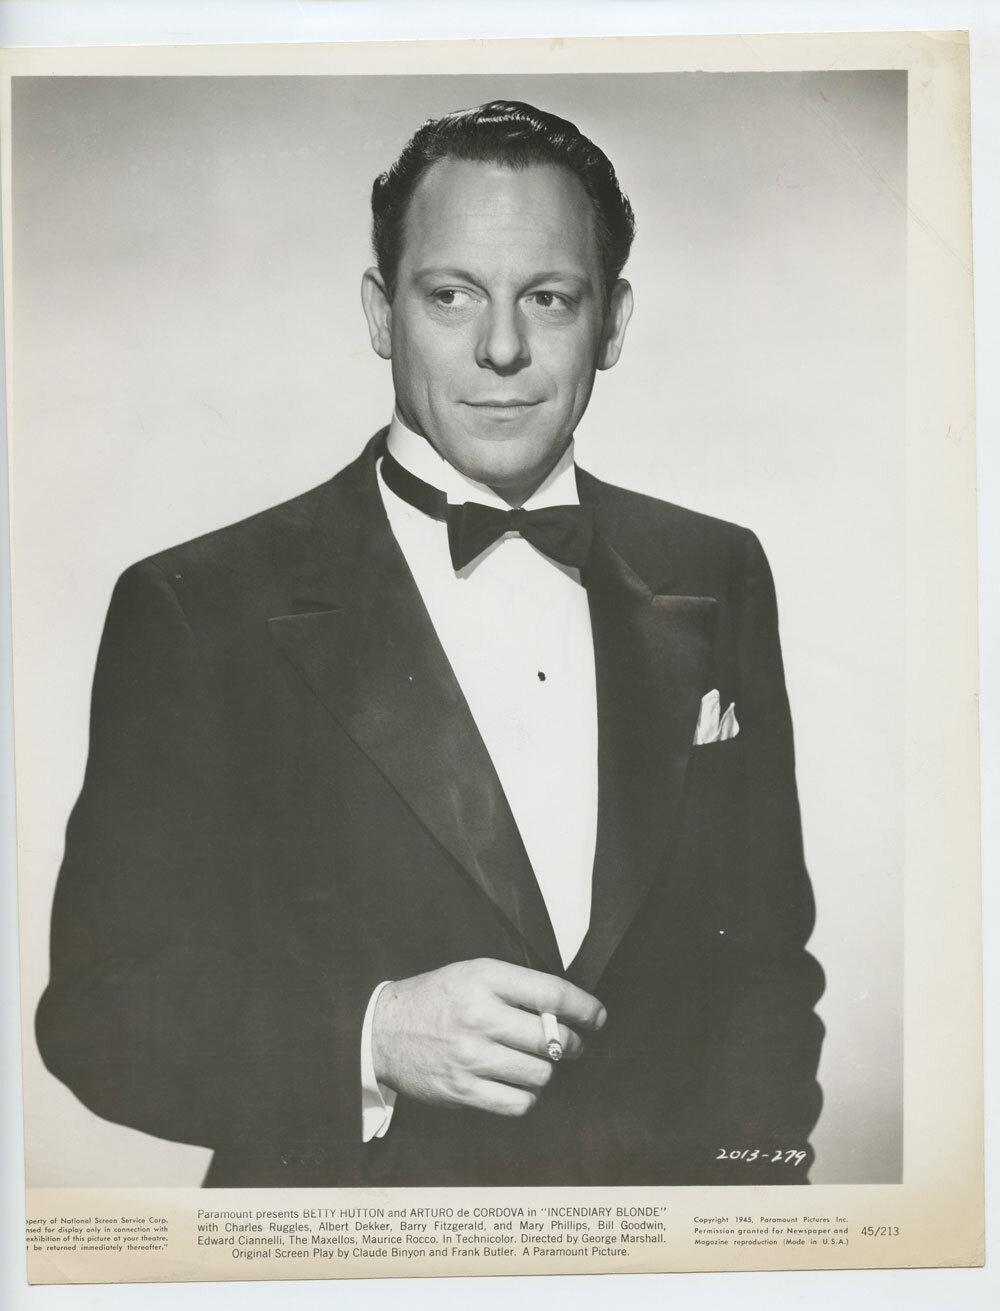 Bill Goodwin Photograph 1944 Incendiary Blonde Original Vintage